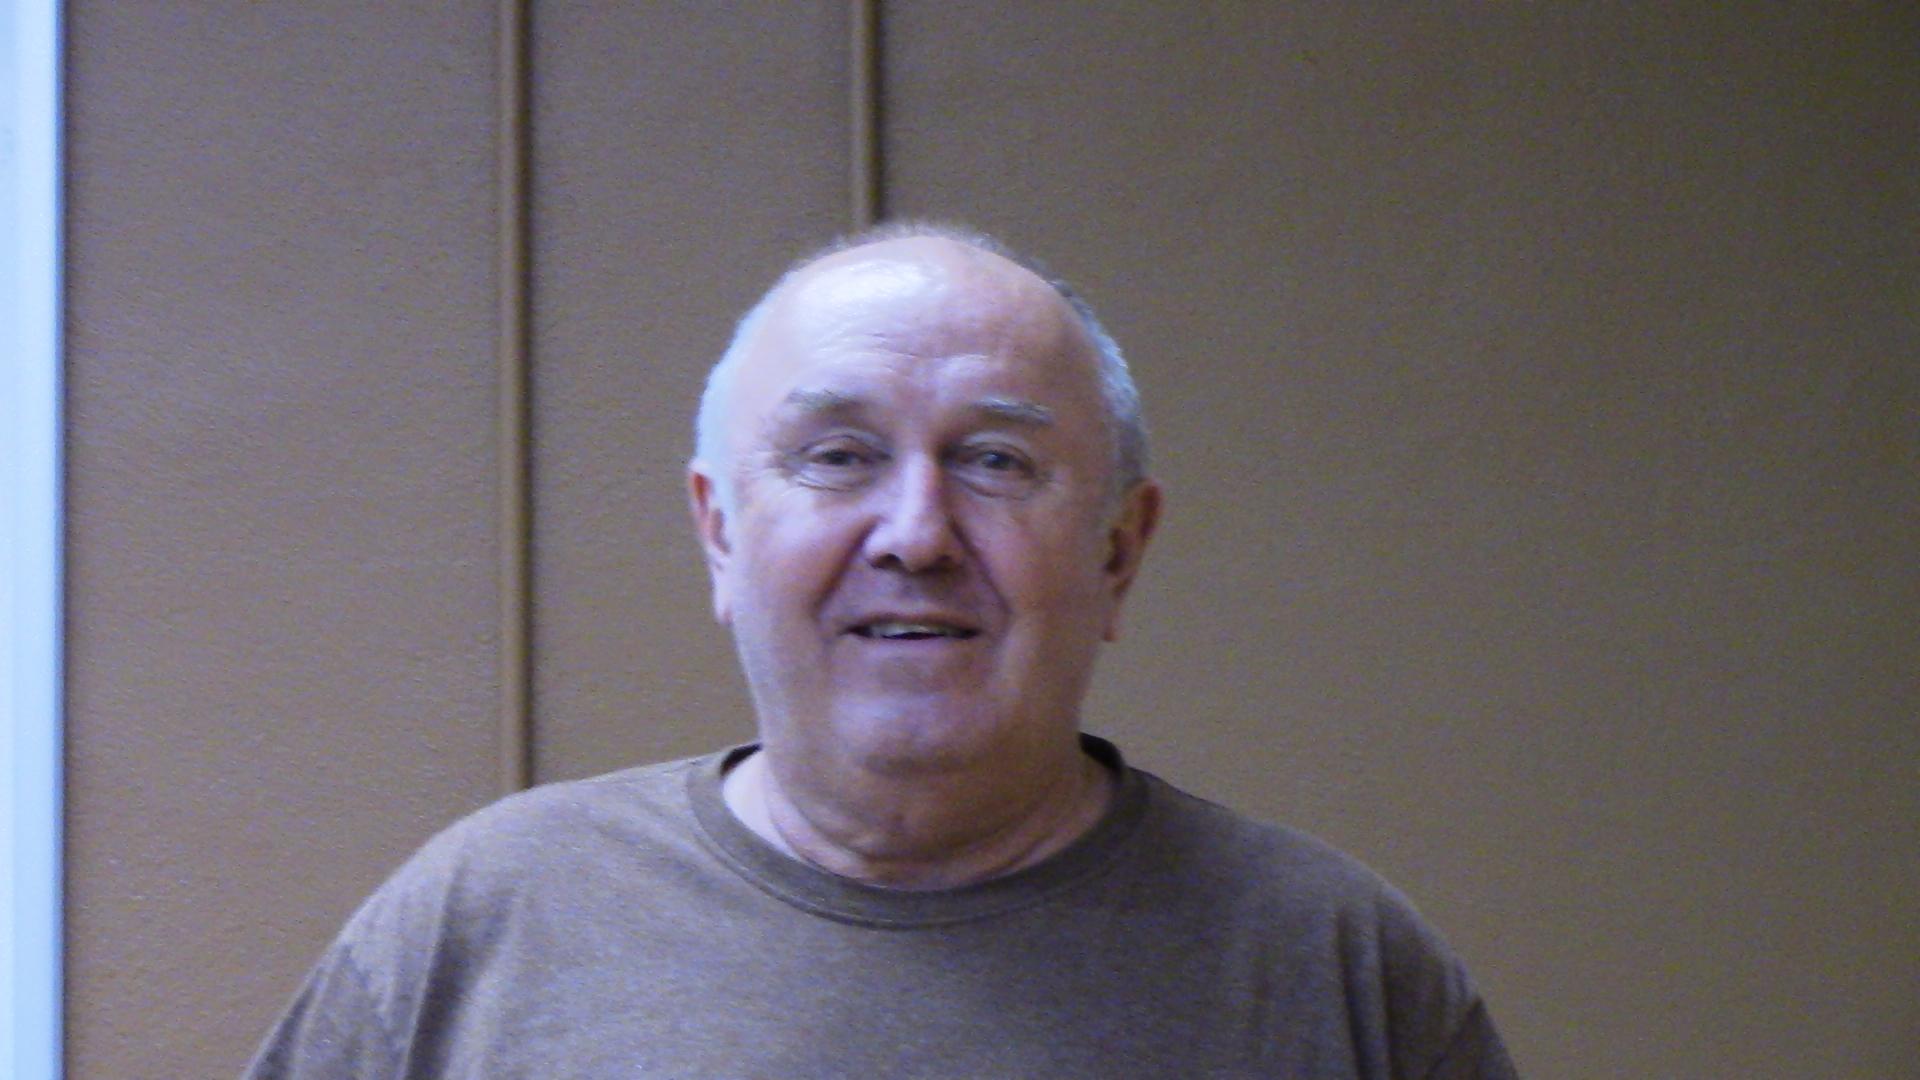 John Wipperfurth